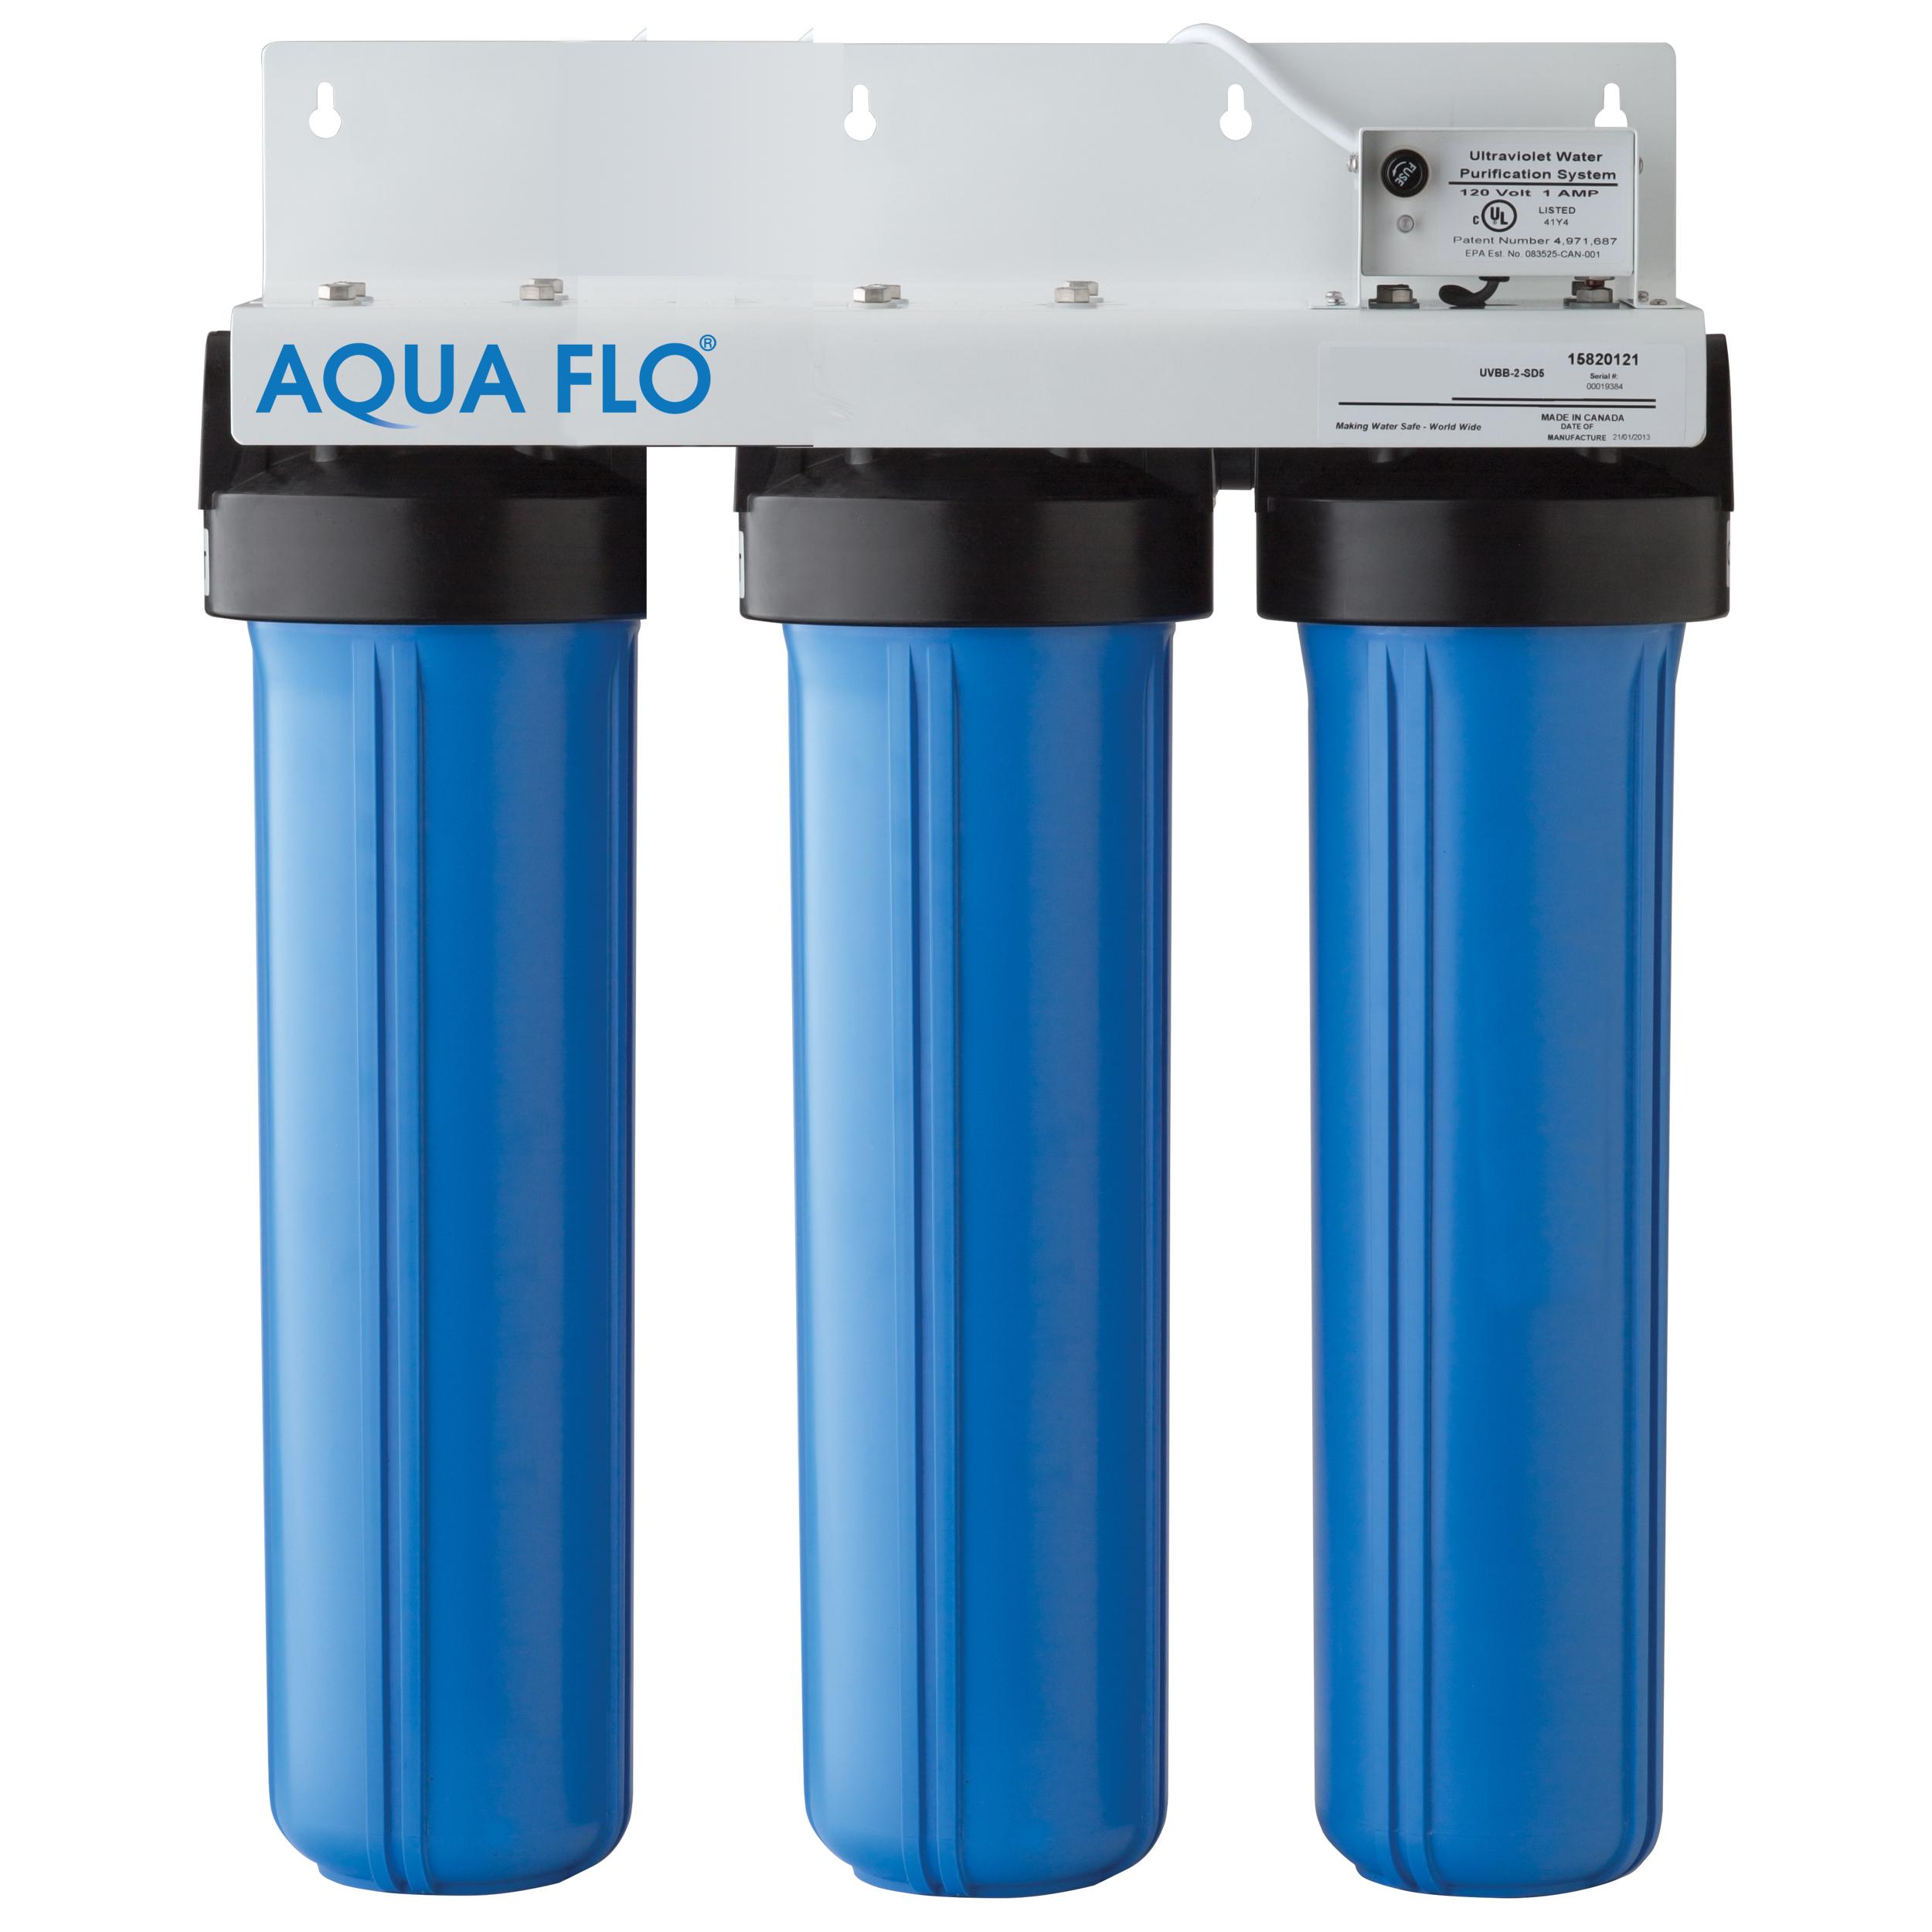 Aqua Flo UV BigBoy-3.jpg